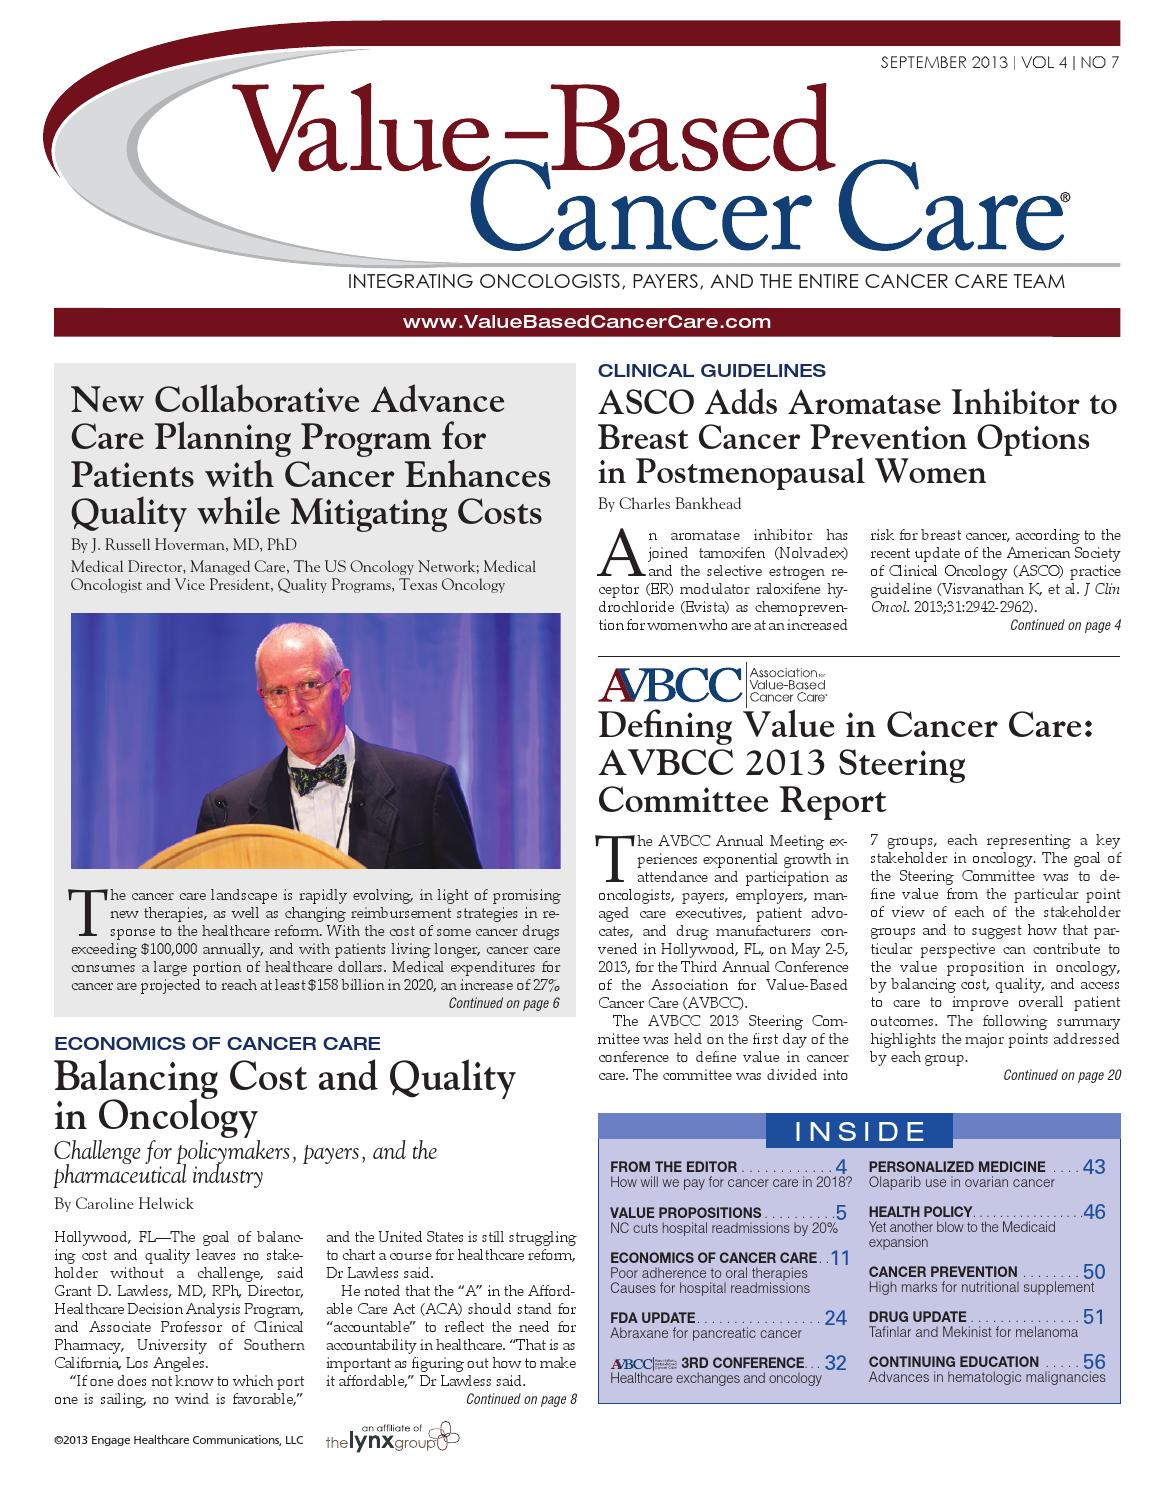 VBCC September 2013 by Value Based Cancer Care issuu